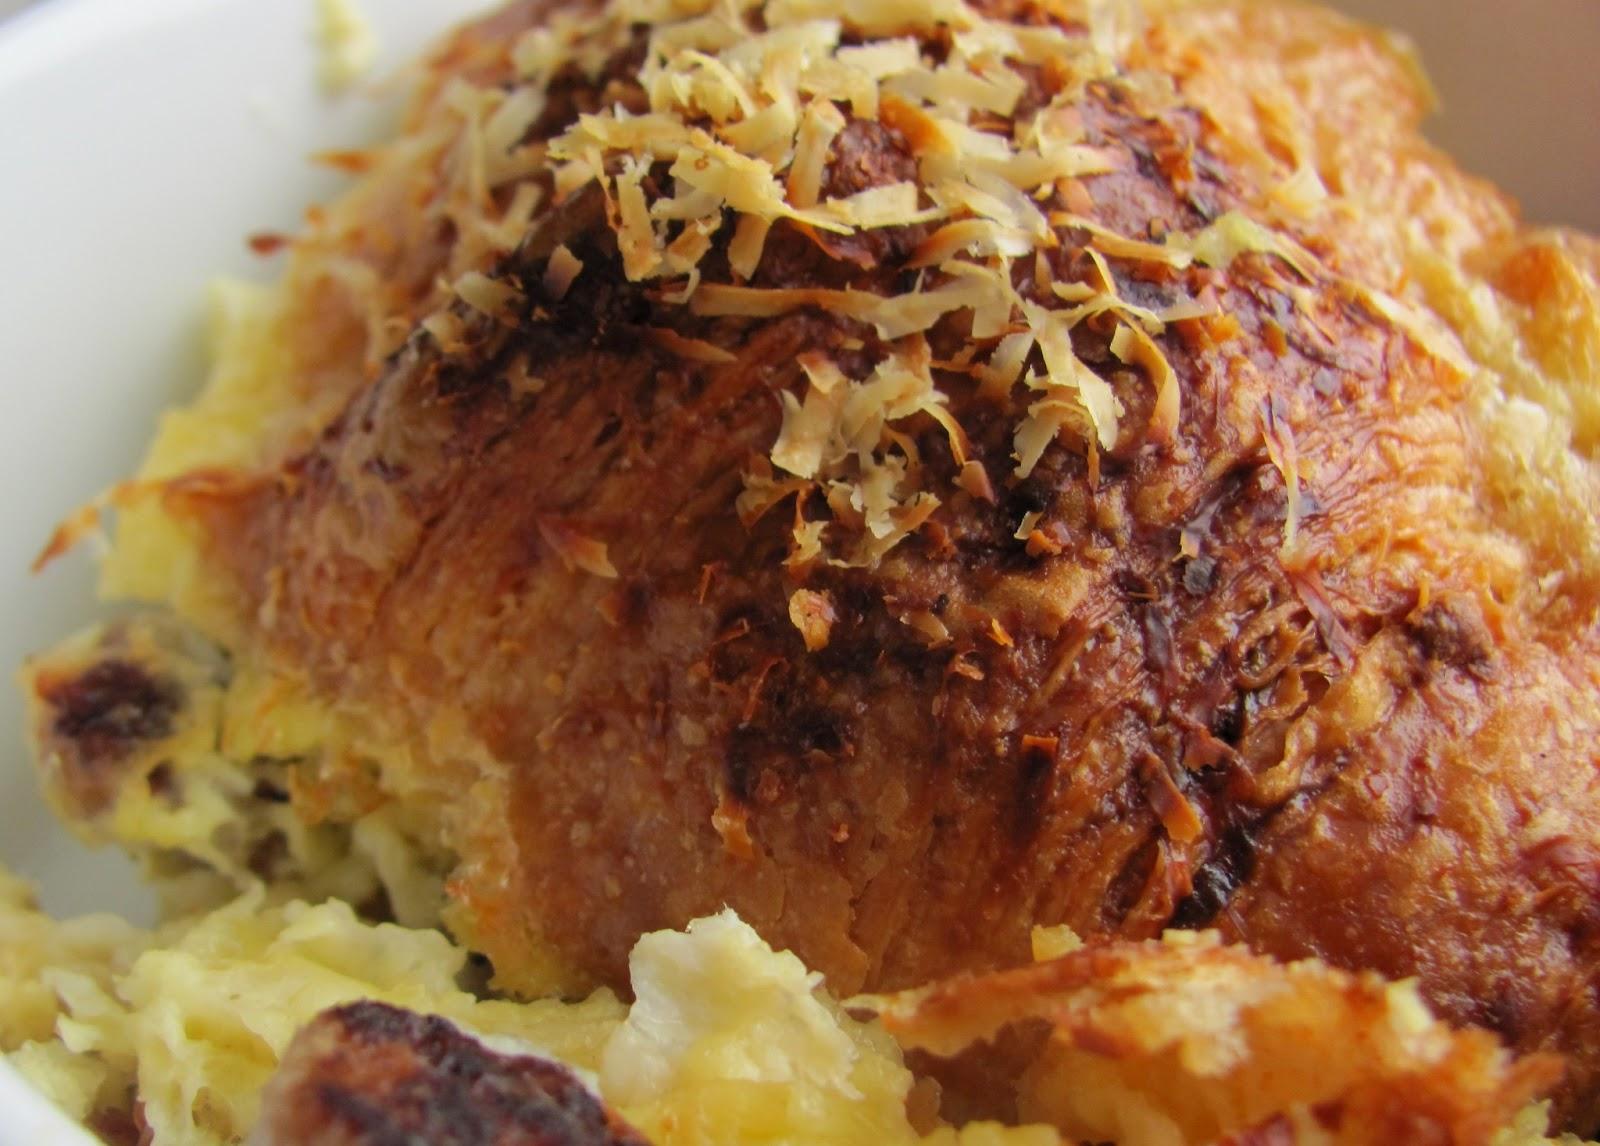 cheddar-cheese-egg-bake-redhead-creamery.jpg